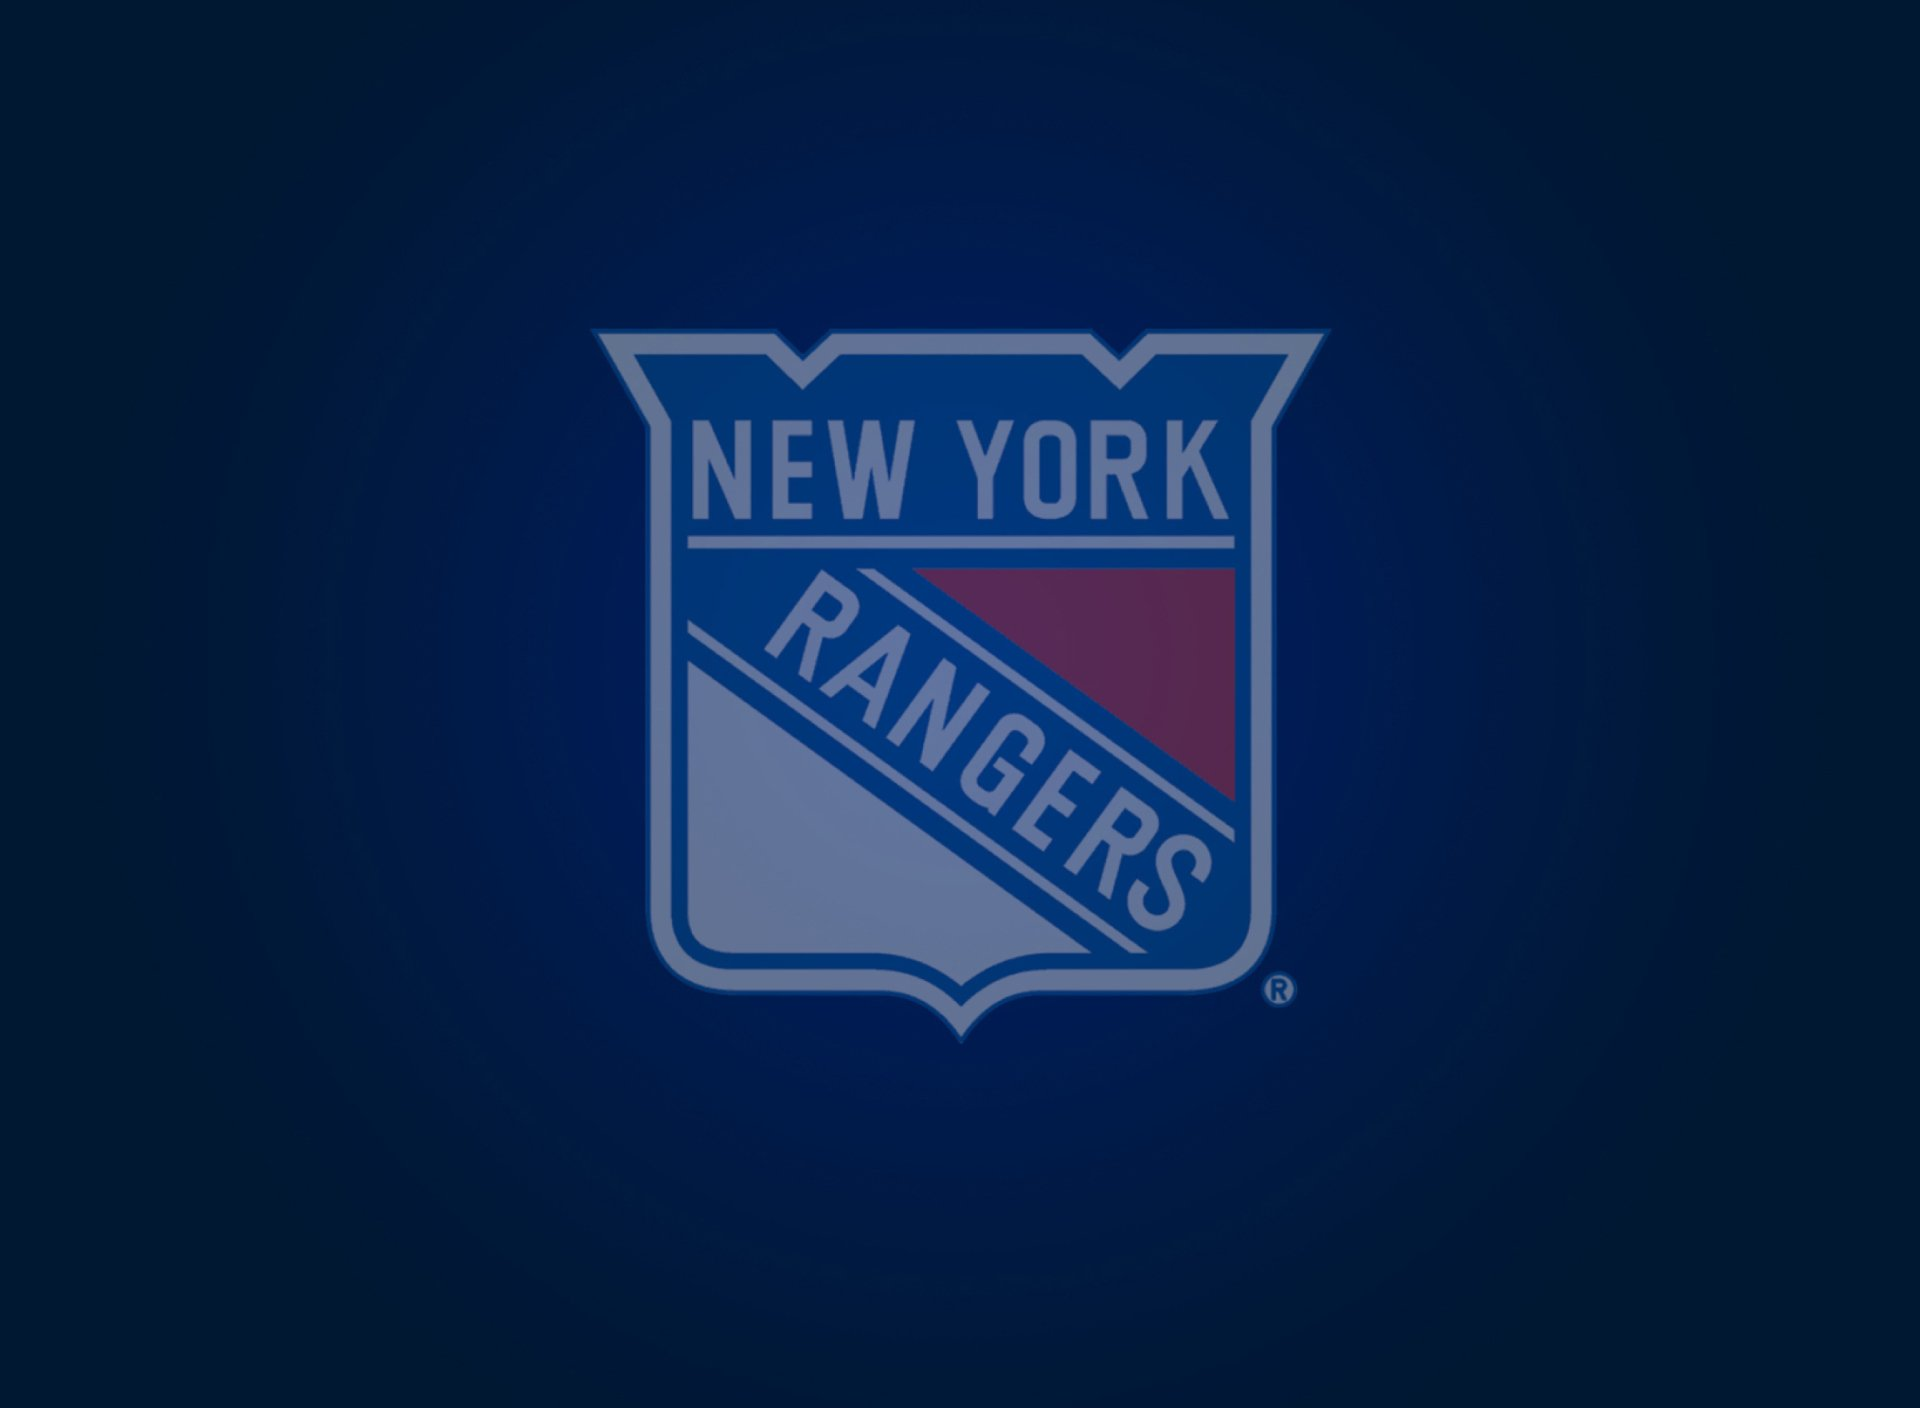 New York Rangers Wallpaper for Samsung Galaxy S5 1920x1408